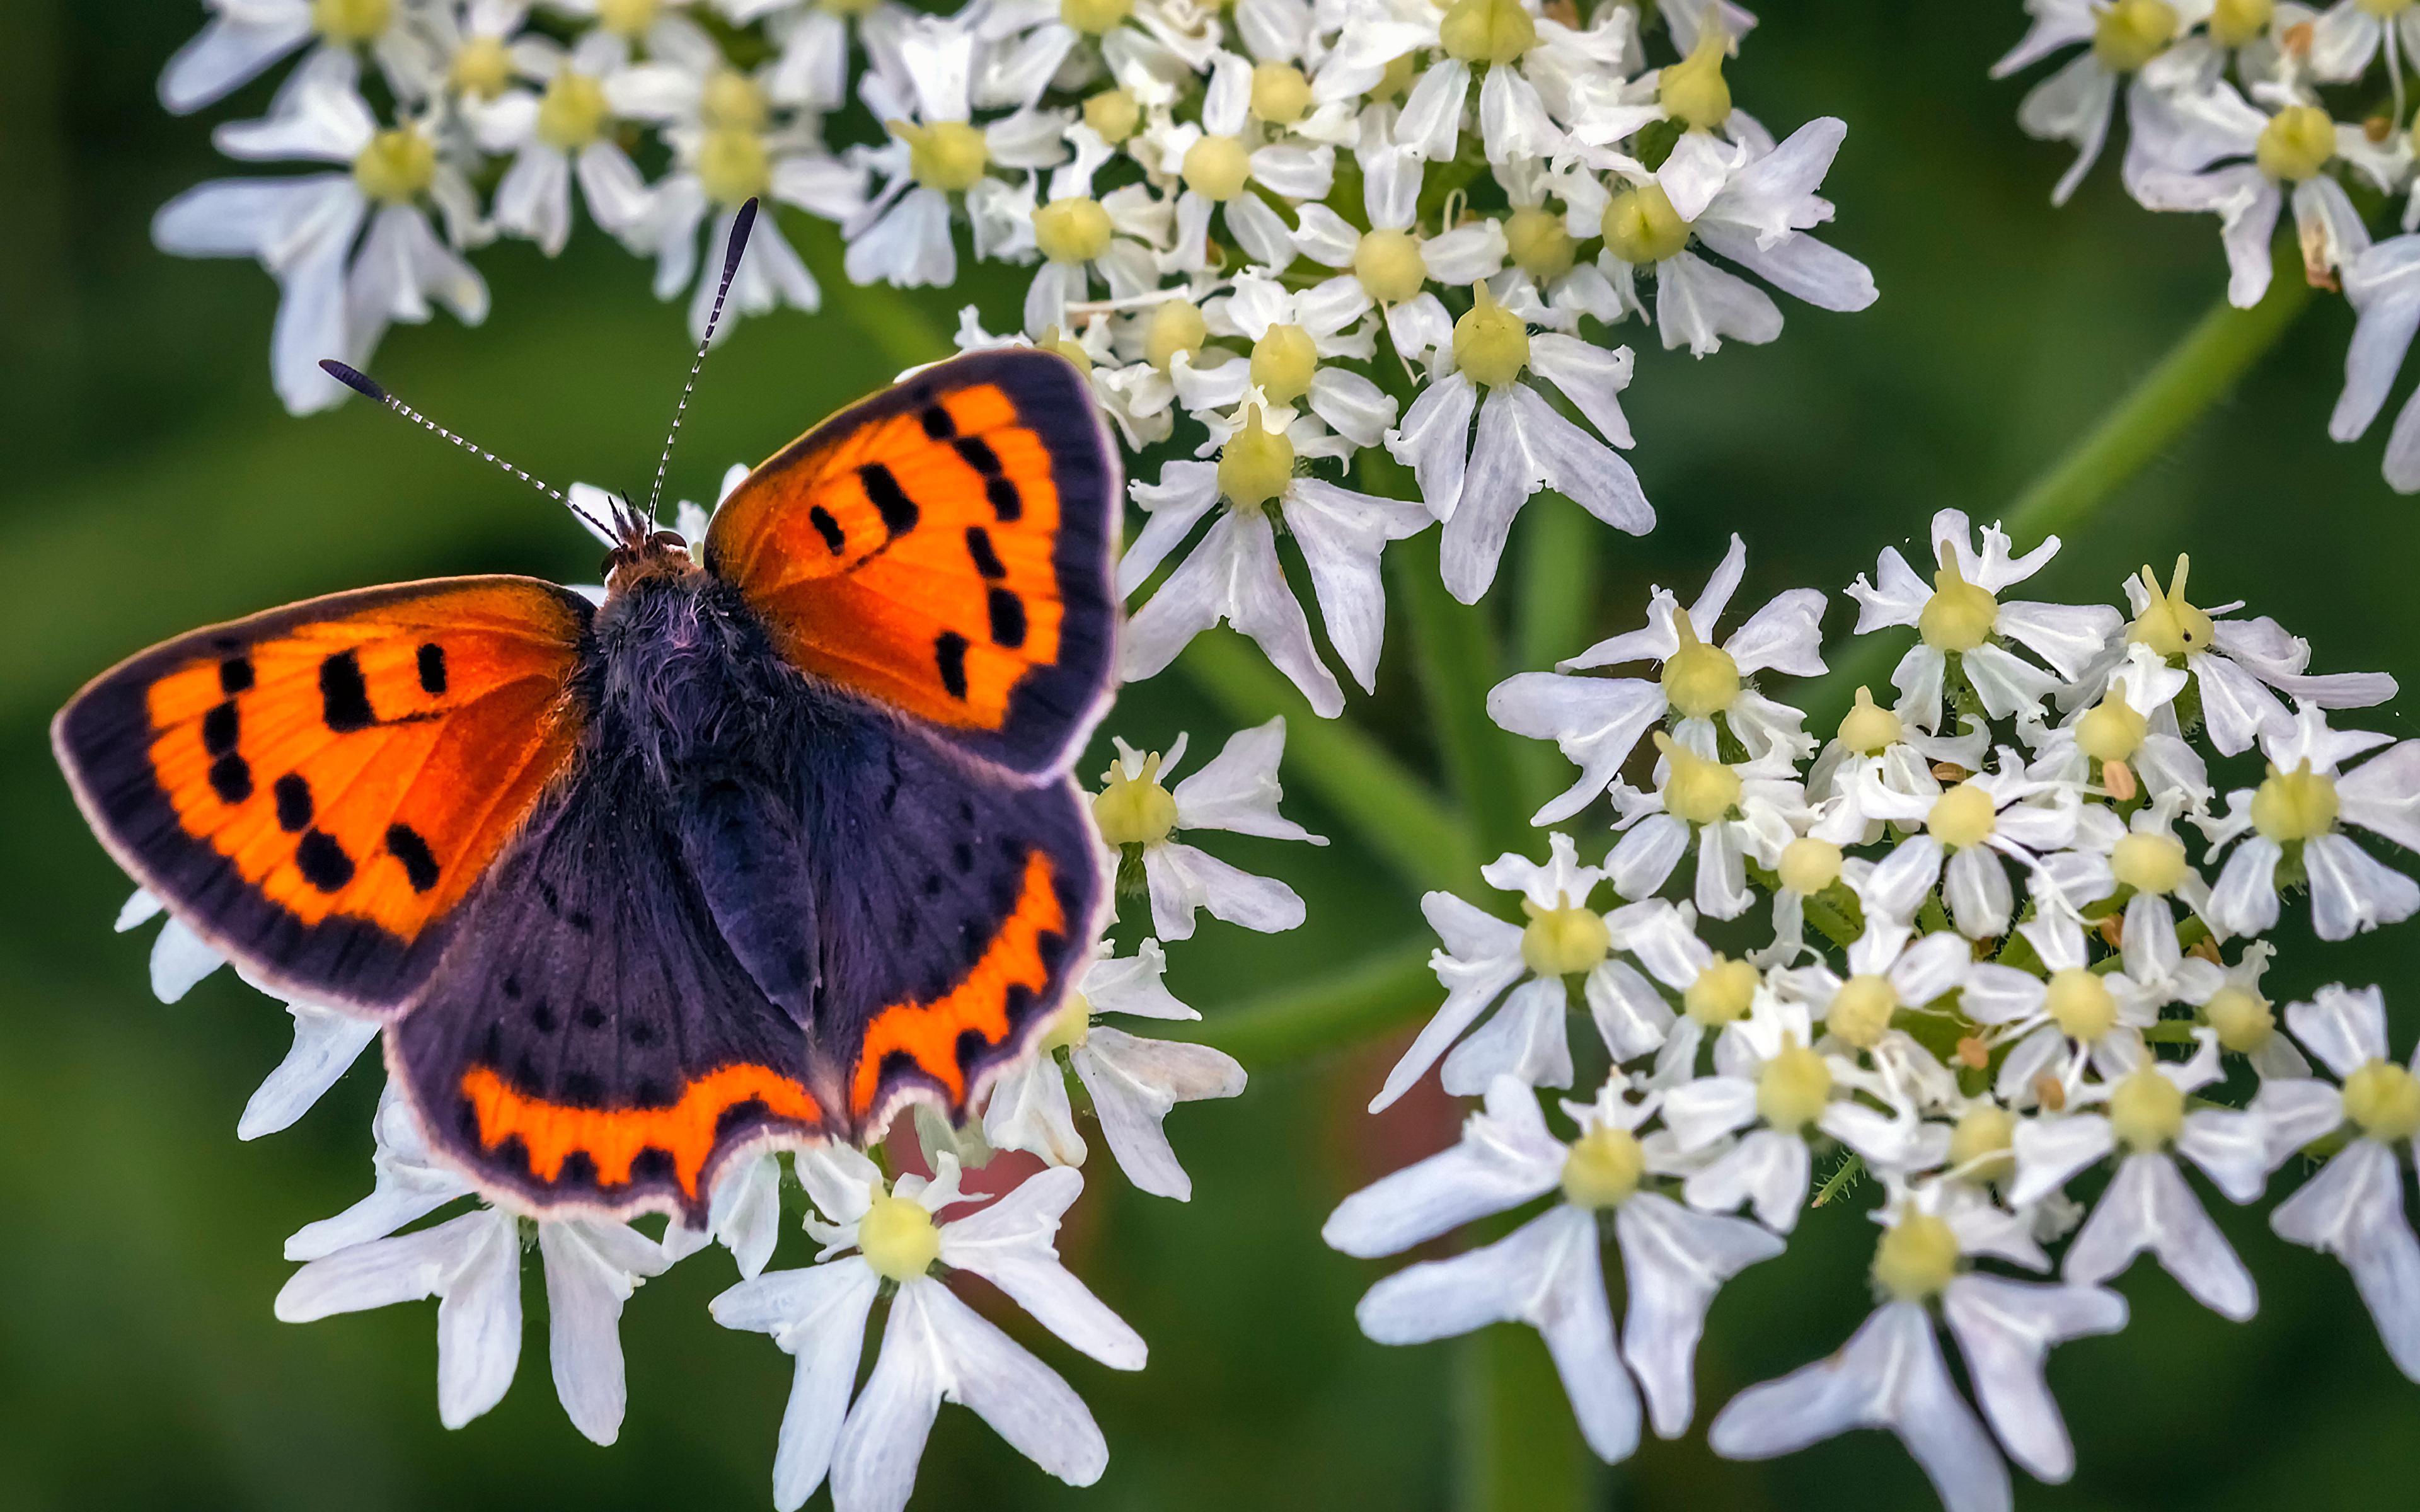 3840x2400 Papilionoidea Insectes En gros plan small copper un animal, papillons Animaux